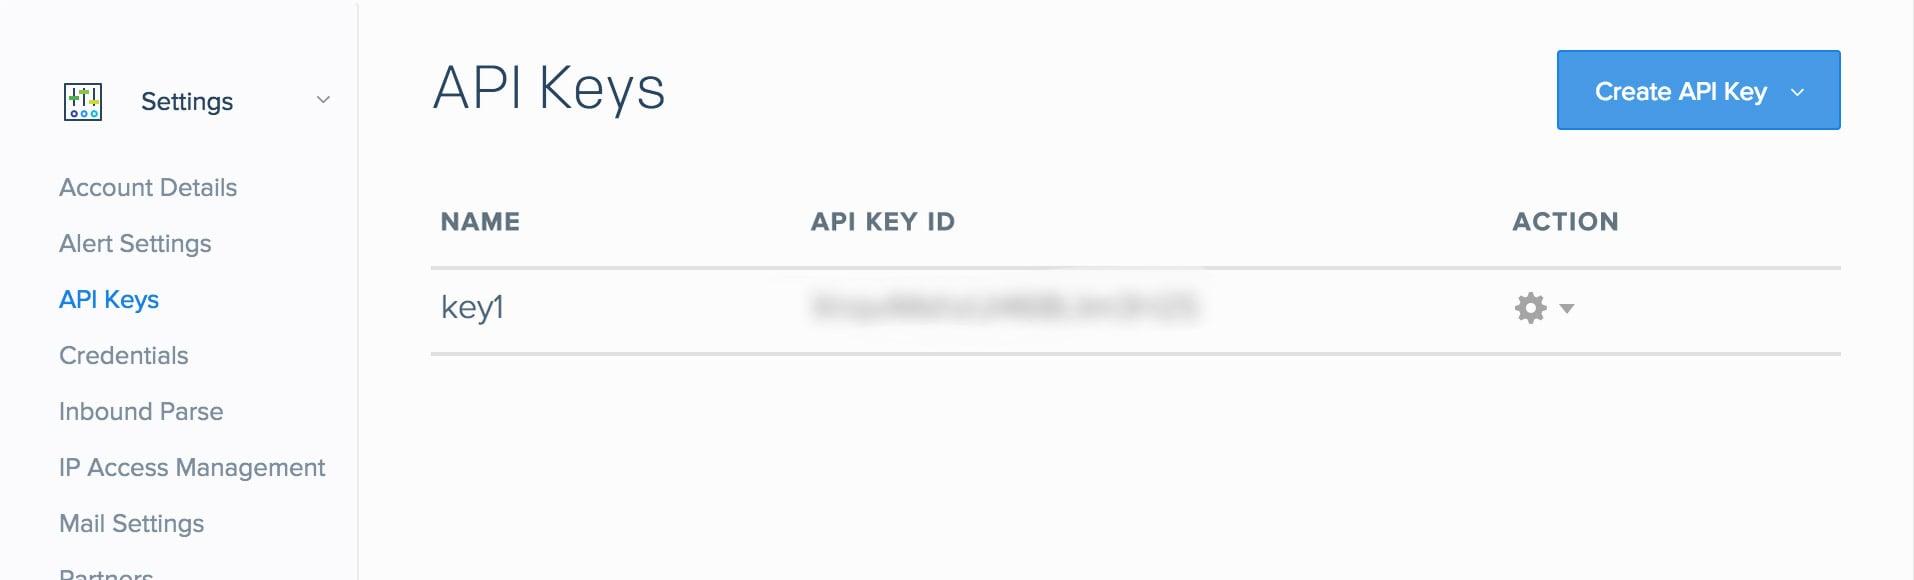 SendGrid API Keys Page